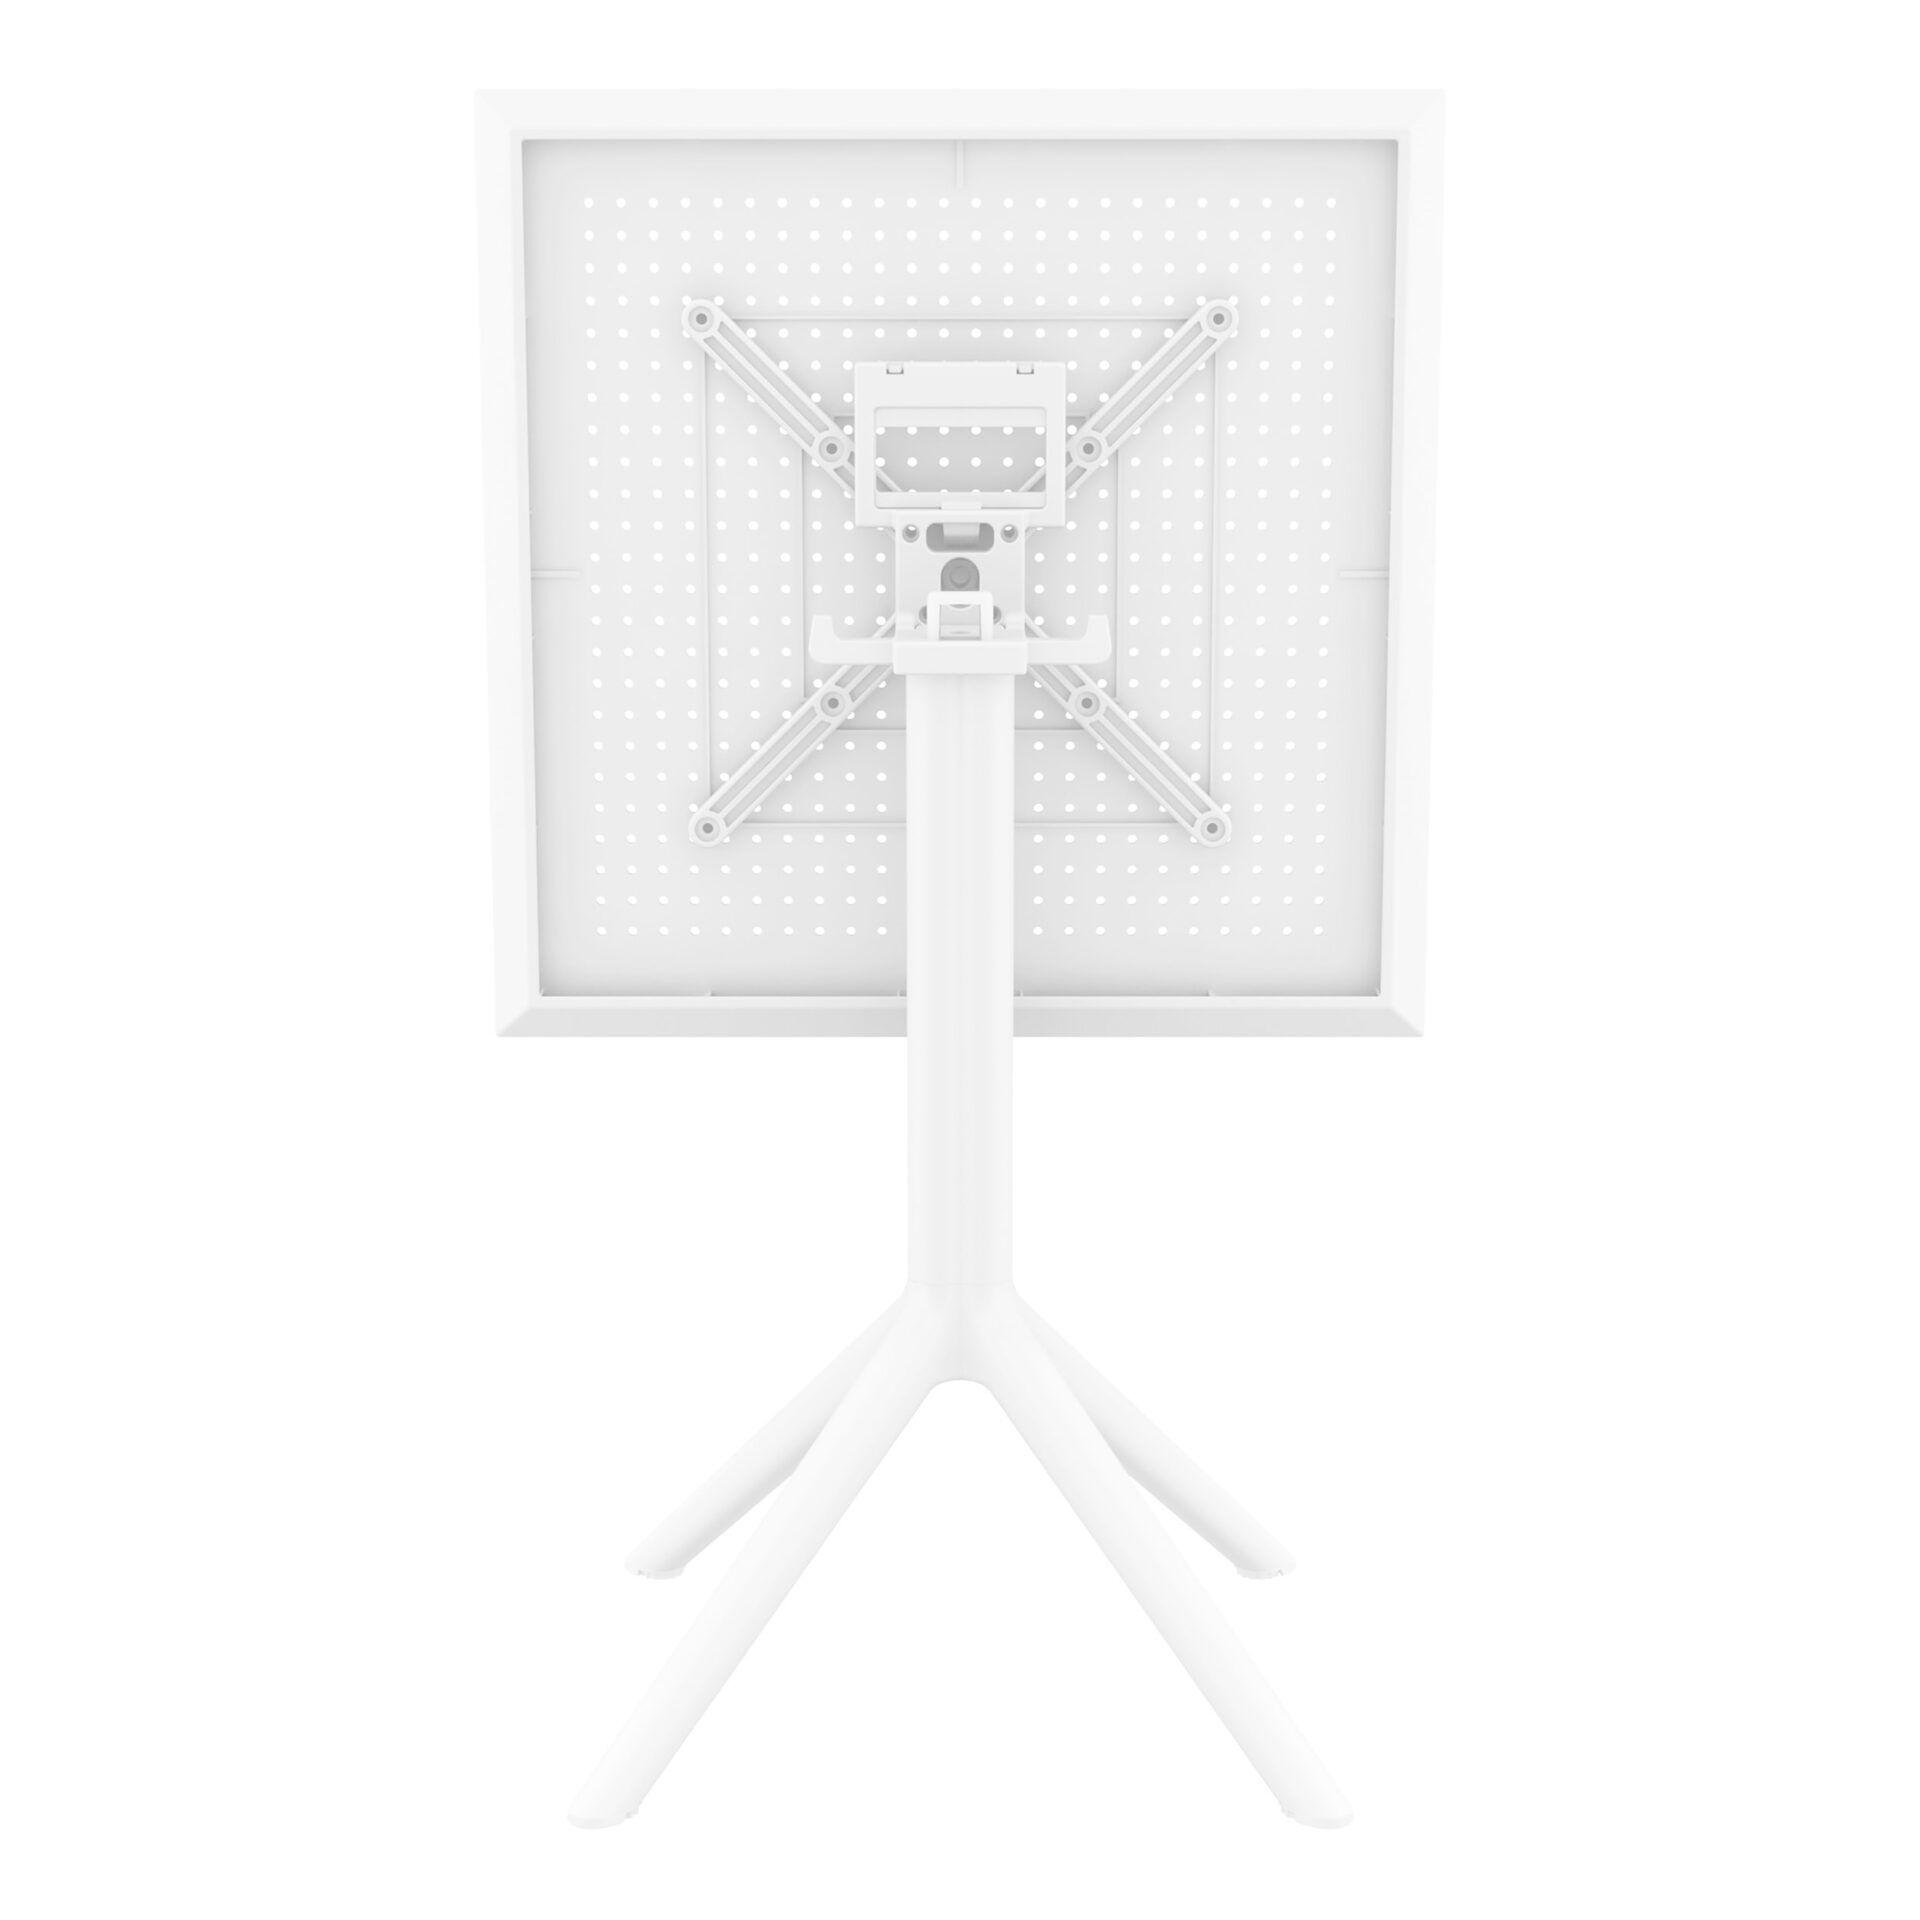 polypropylene outdoor sky folding bar table 60 white k back